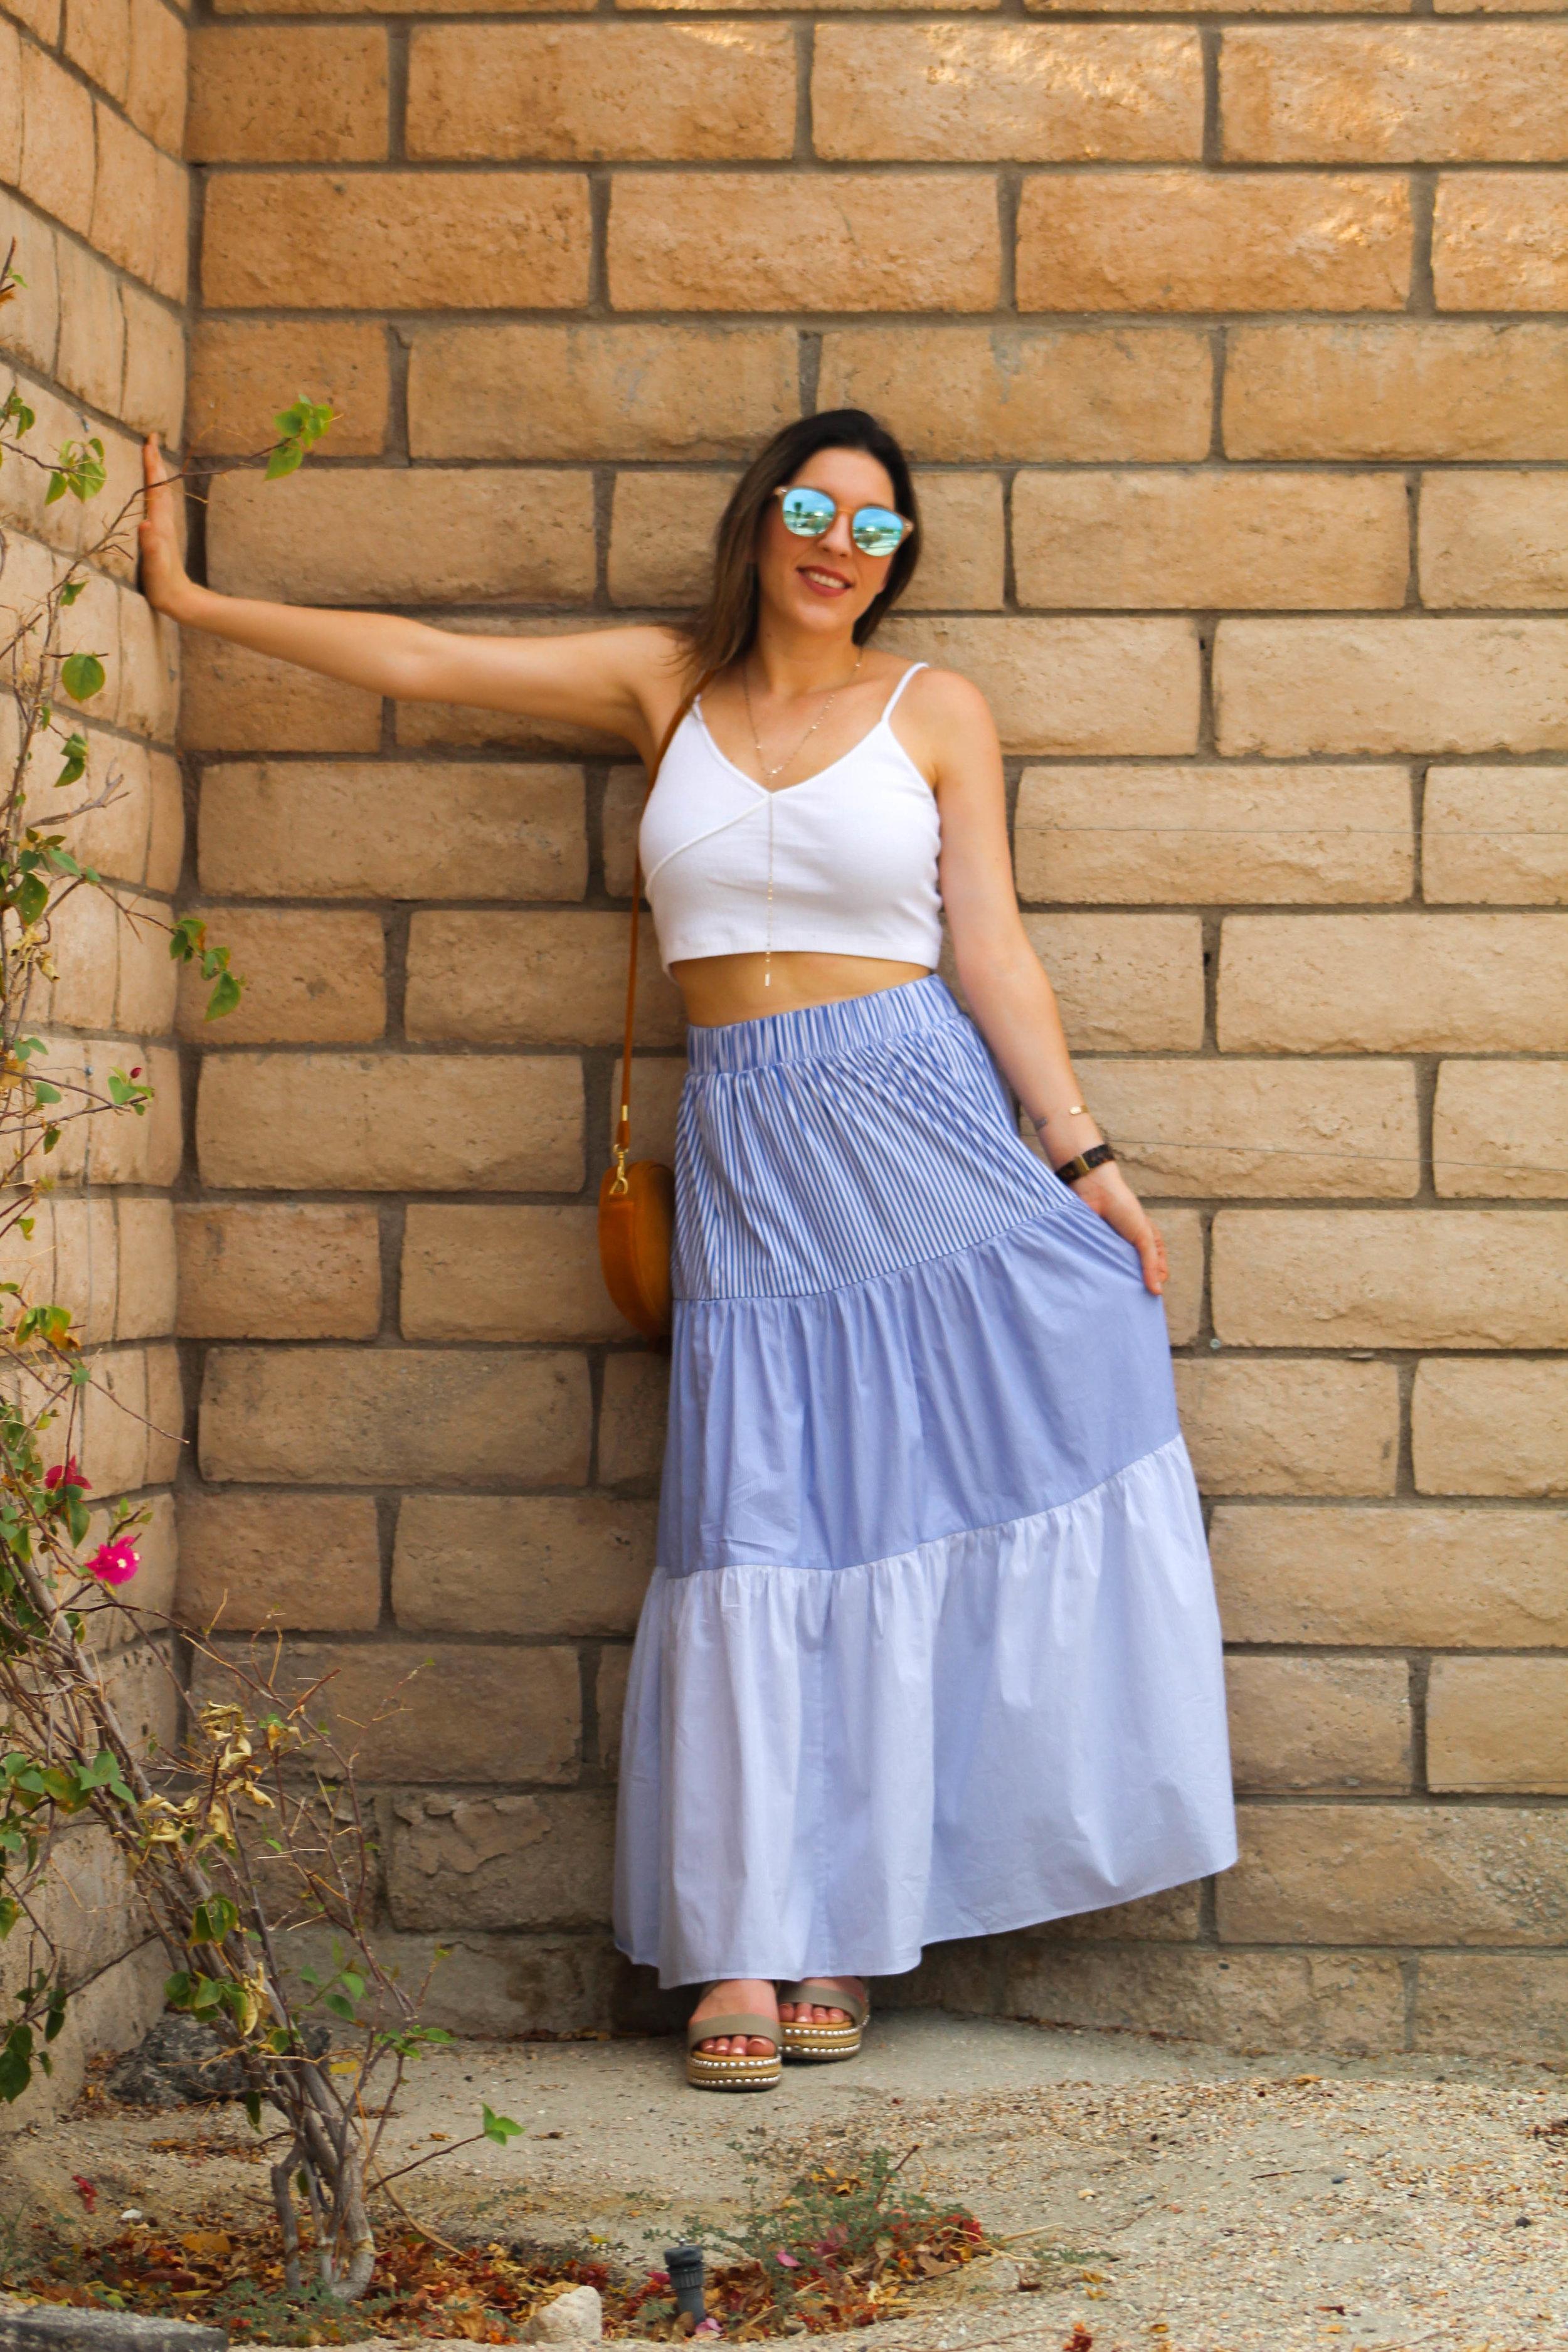 Skirt: Zara,   similar here   // Top:   Topshop   // Shoes:   Seven Dials   // Purse:   similar here   // Sunnies:   Le Specs